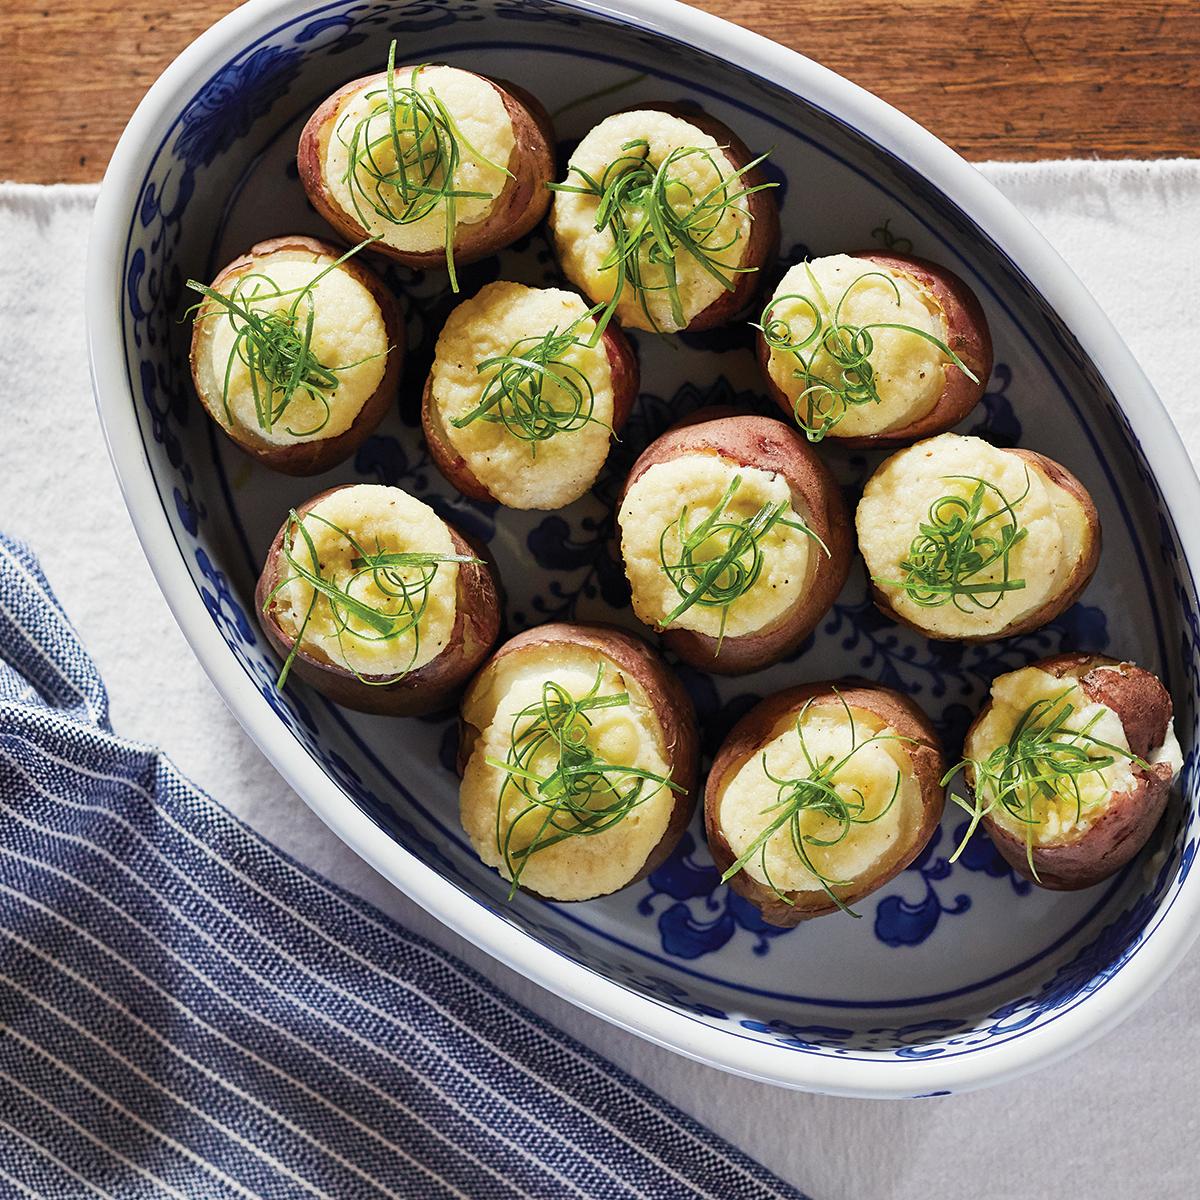 baked stuffed new potatoes